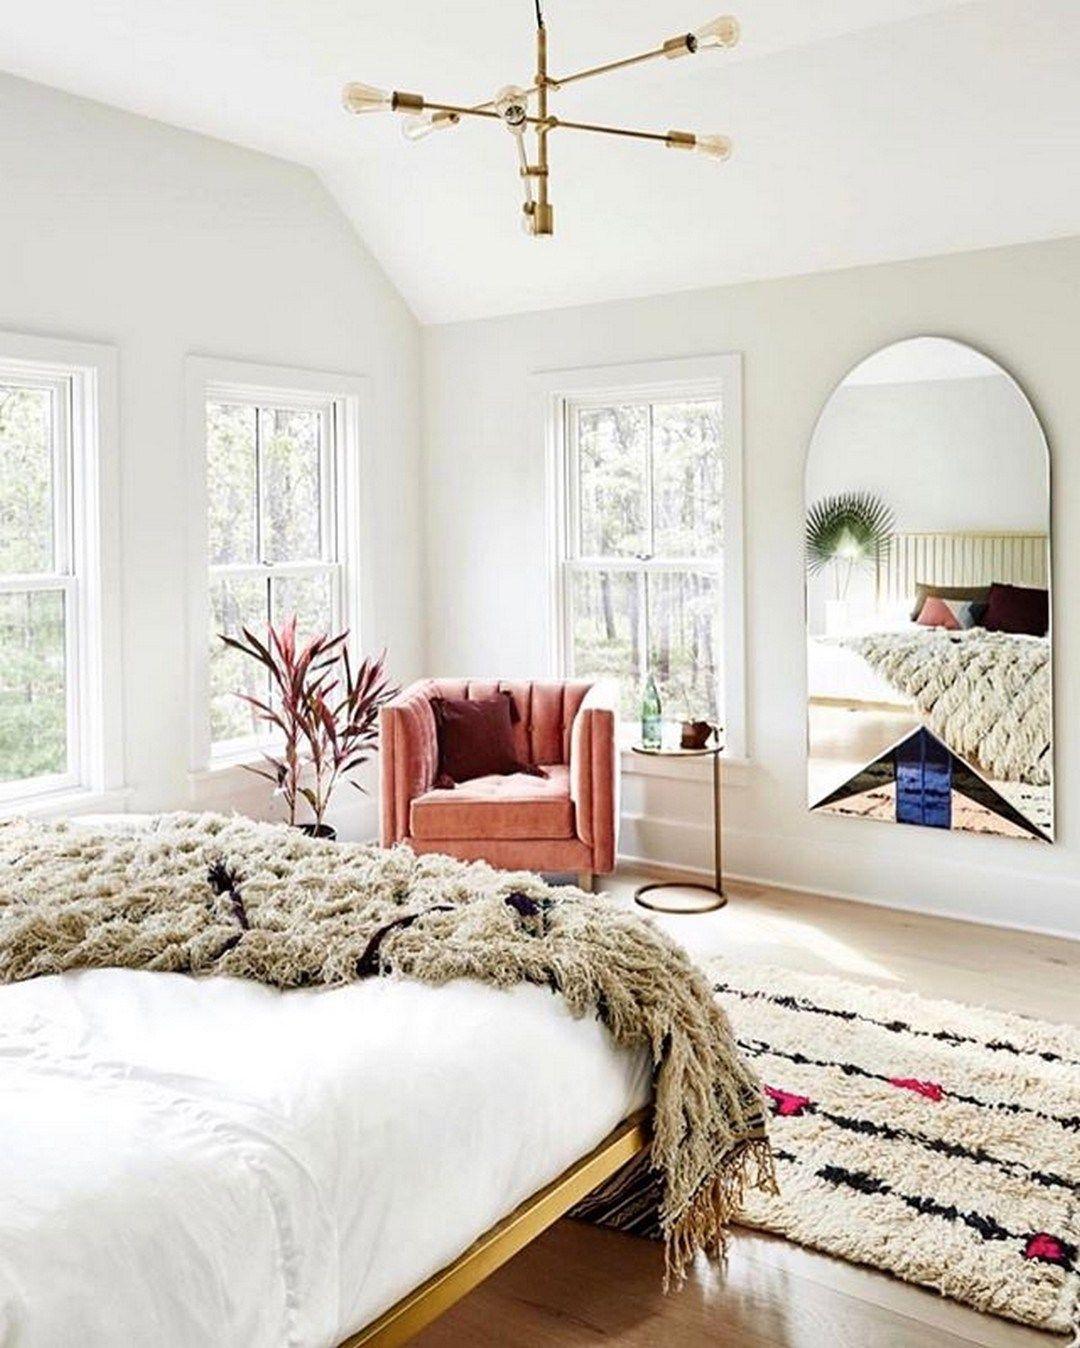 Elegant bedroom interior design pretty pink chair   elegant cozy bedroom ideas with small